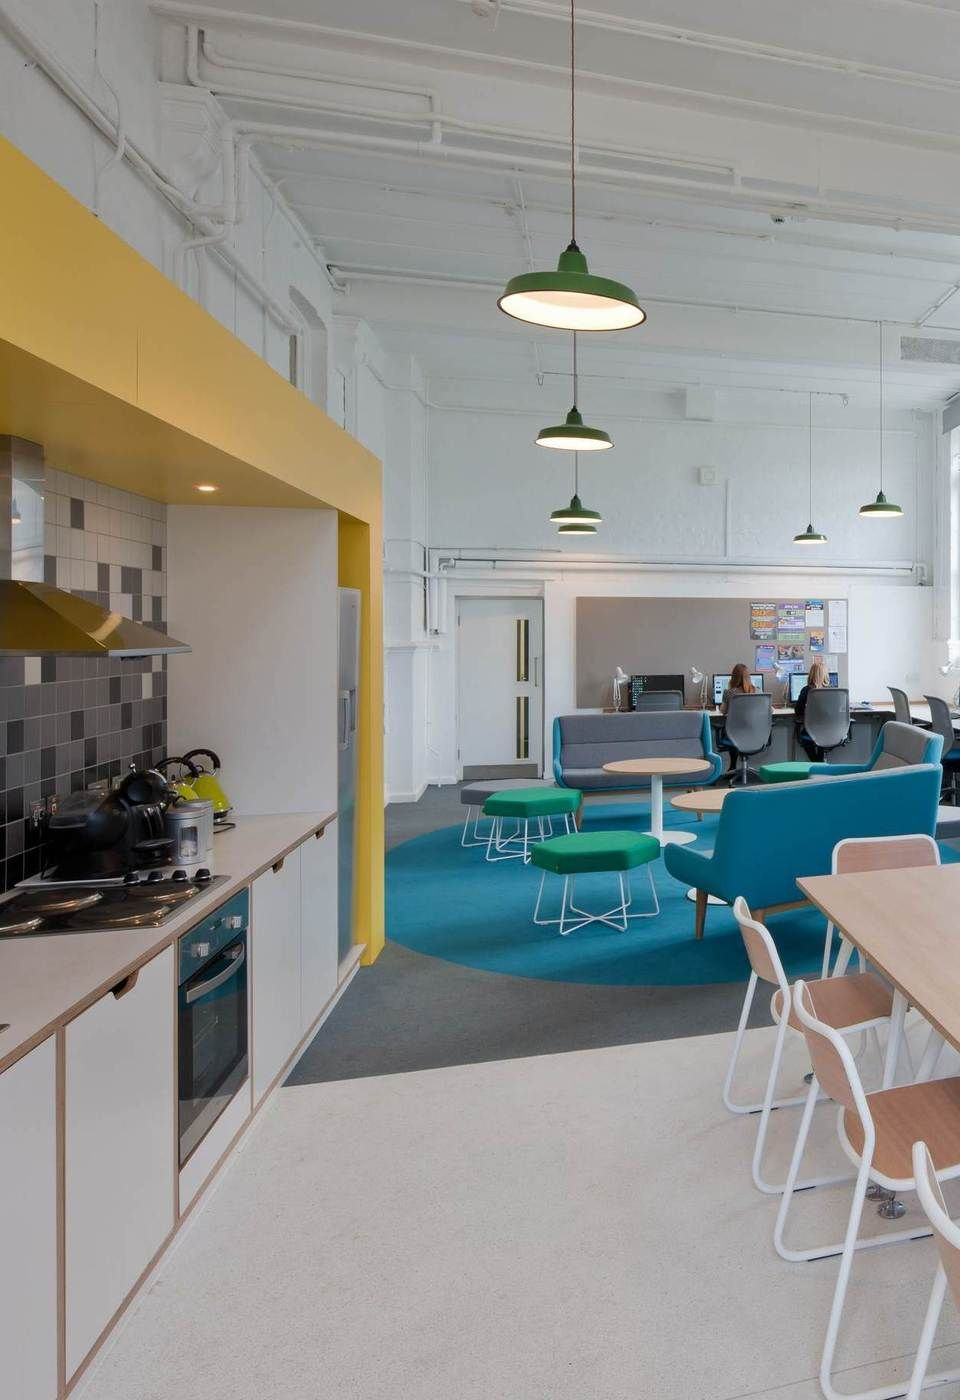 Study Room Interior Design: Study Room Design, Staff Room